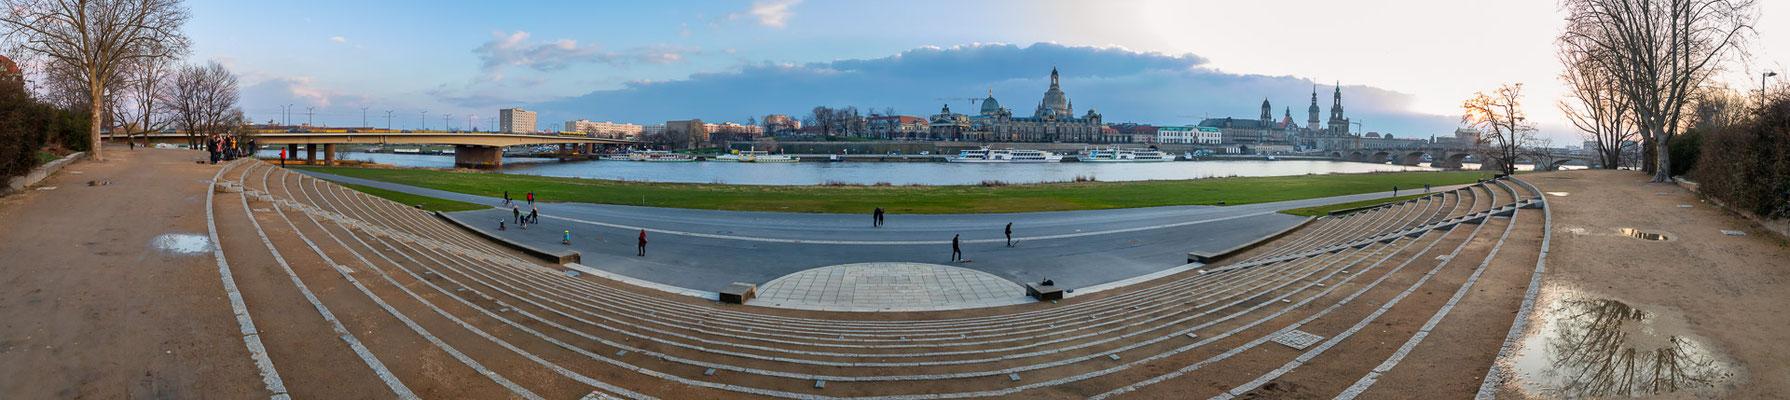 Panorama von Dresdens Silhouette - Foto: Rita Boden